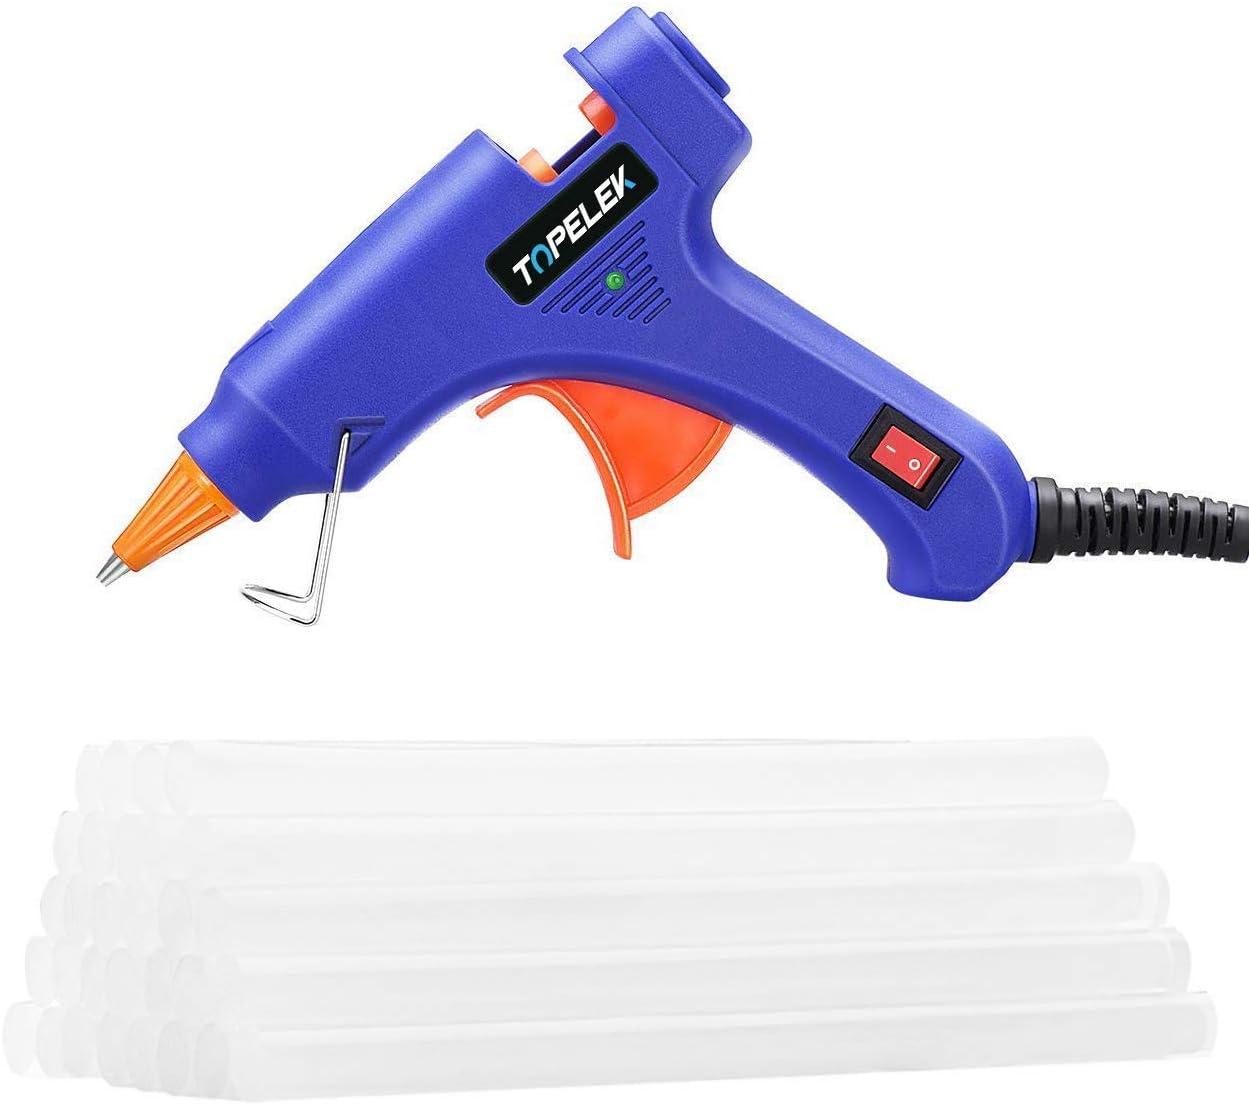 Hot Glue Gun, TOPELEK Mini Heating Hot Melt Glue Gun with 27pcs Melt Glue  Sticks, Melting Glue Gun Set for School DIY Arts and Crafts Projects, Home